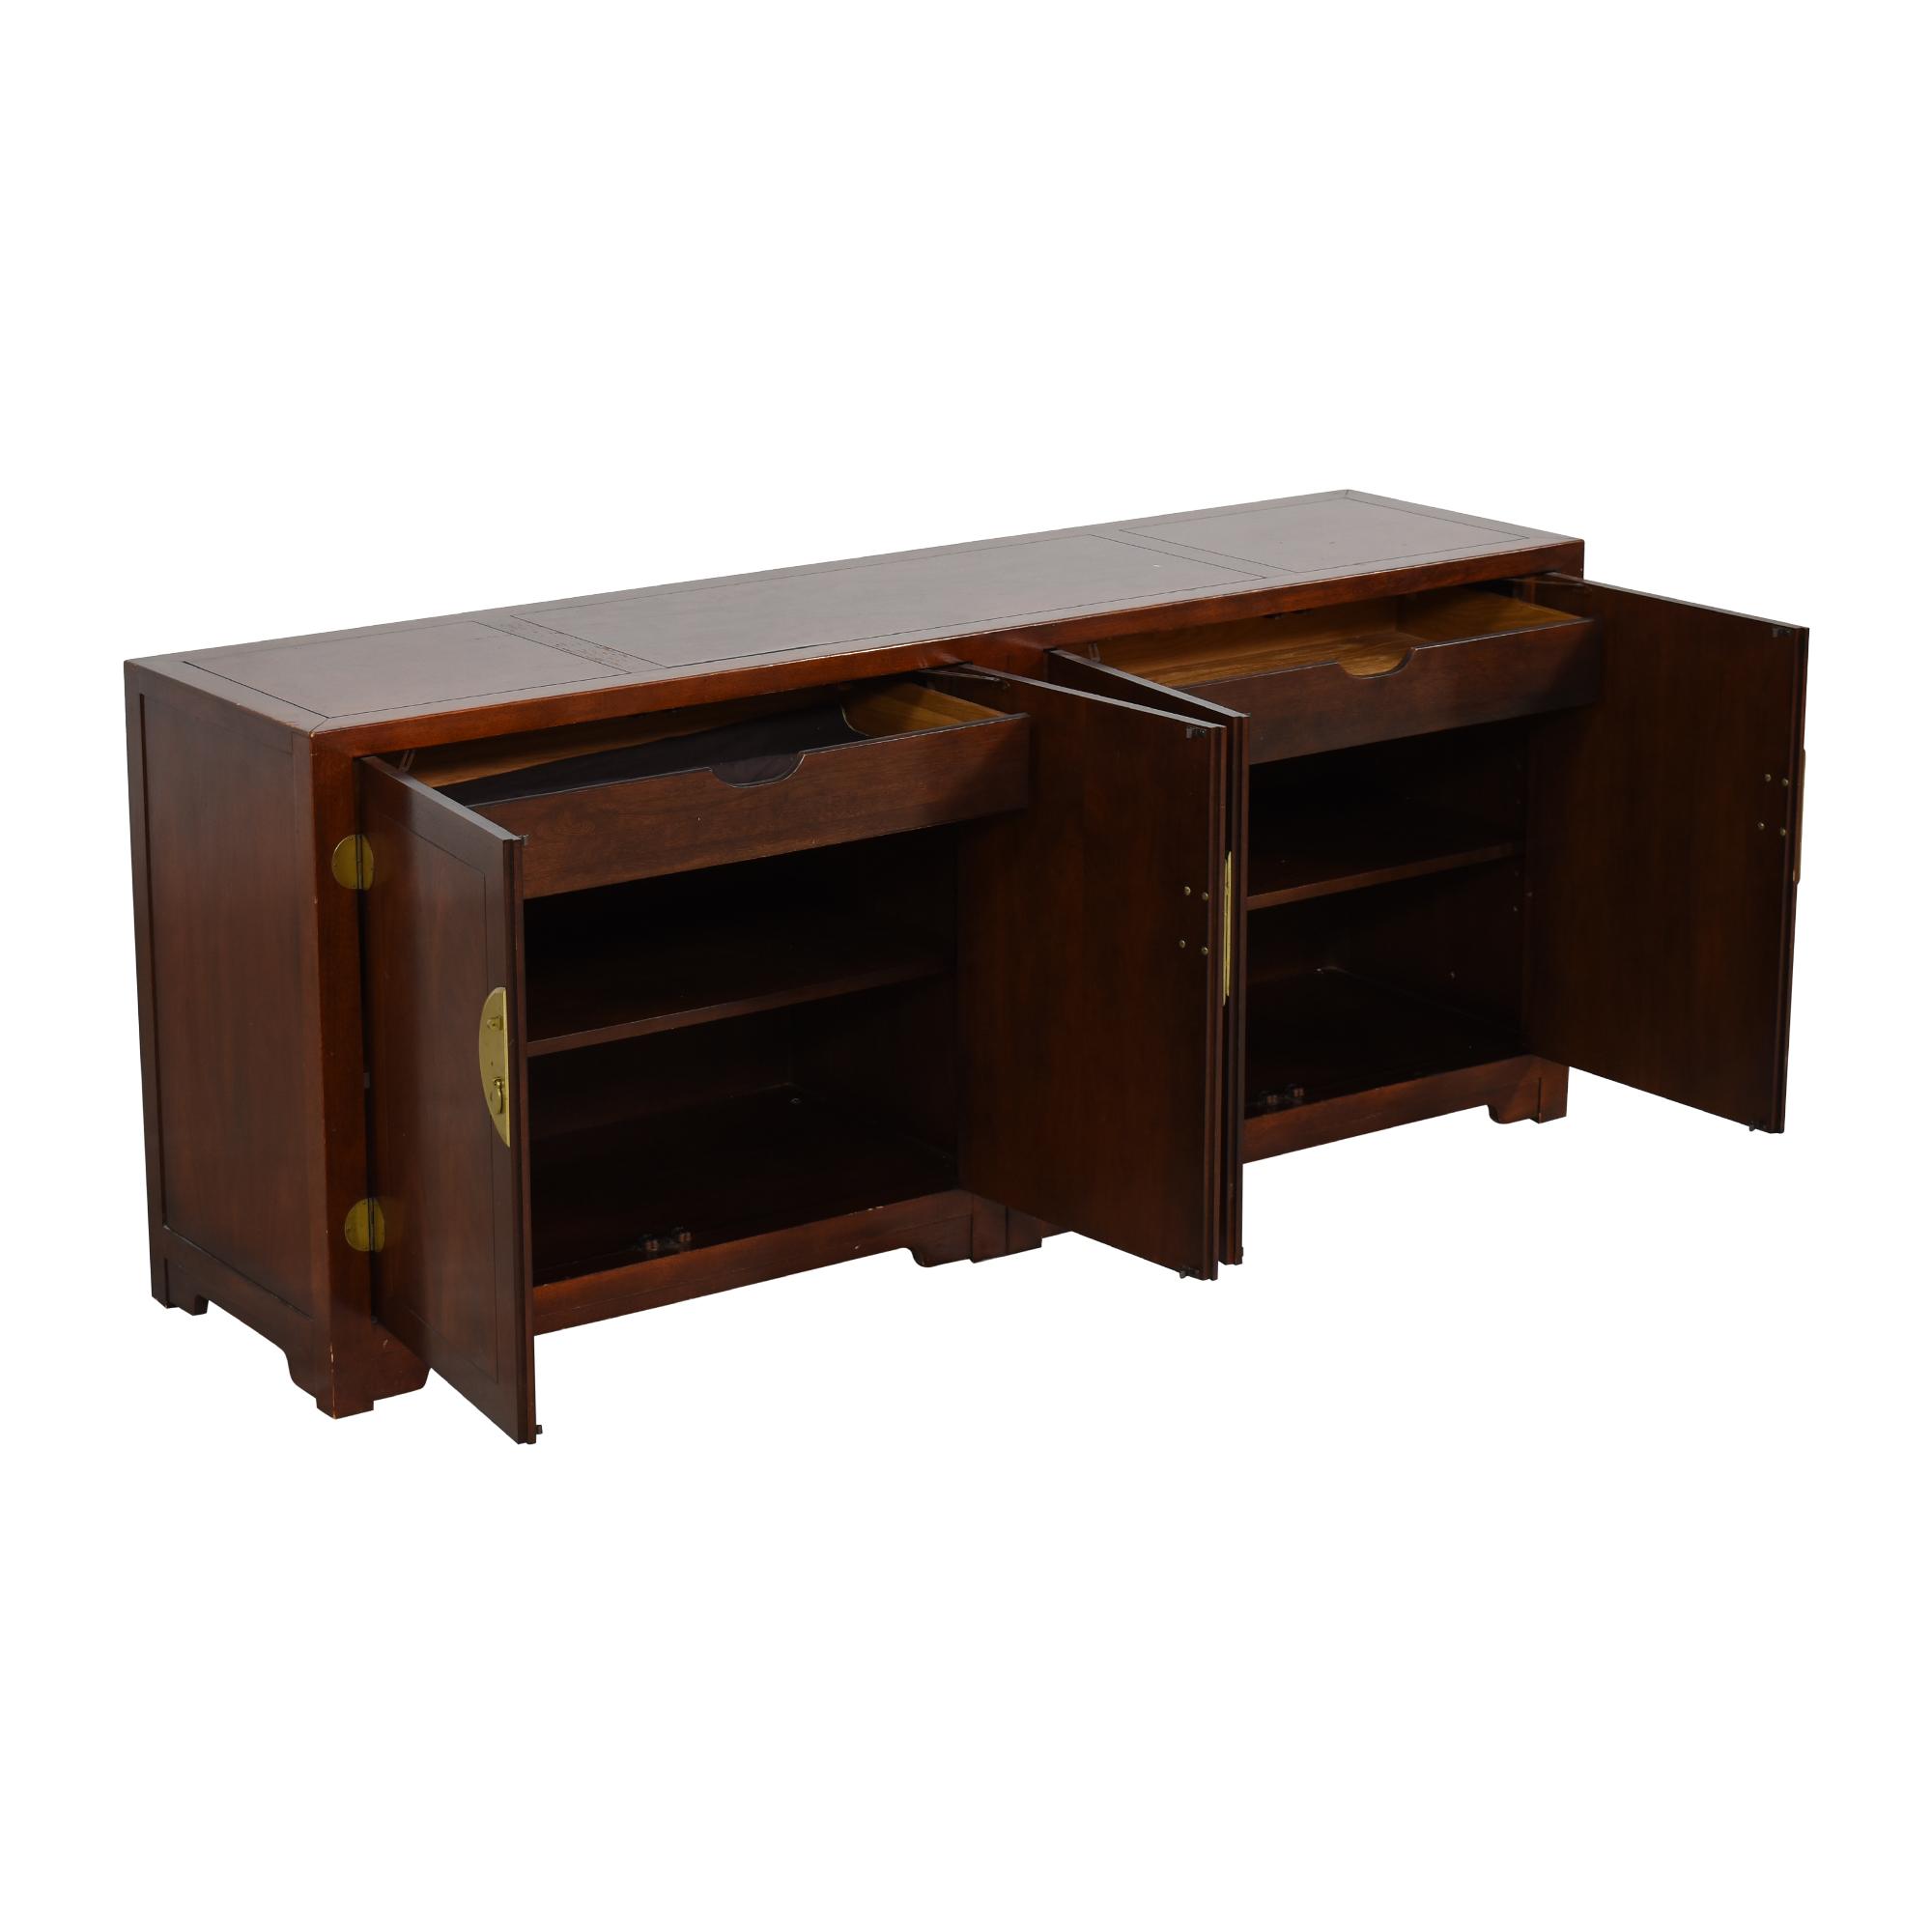 shop Baker Furniture Baker Furniture Far East Collection Double Chest Sideboard online